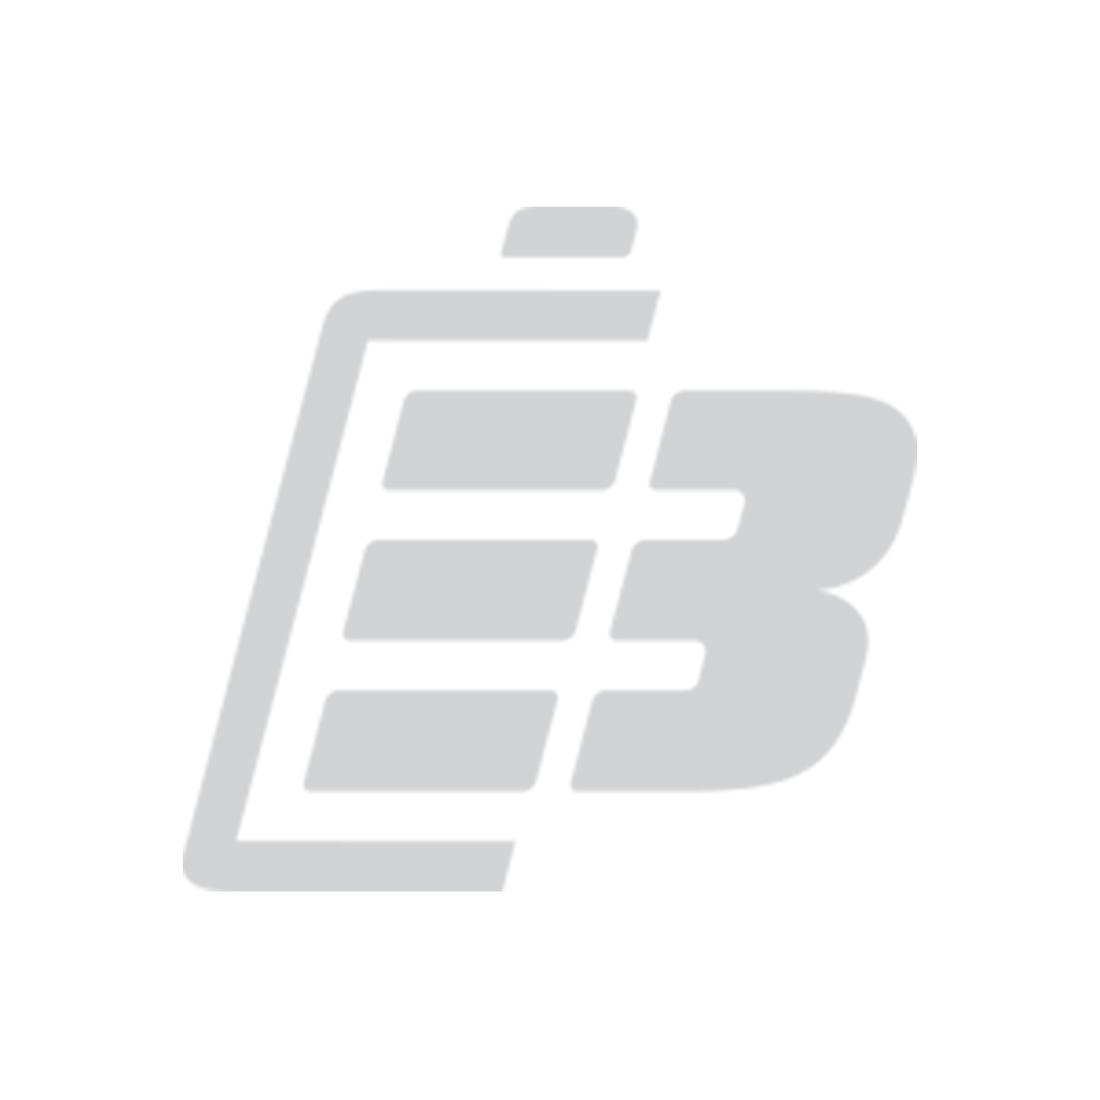 Olight RN 400 Bike light